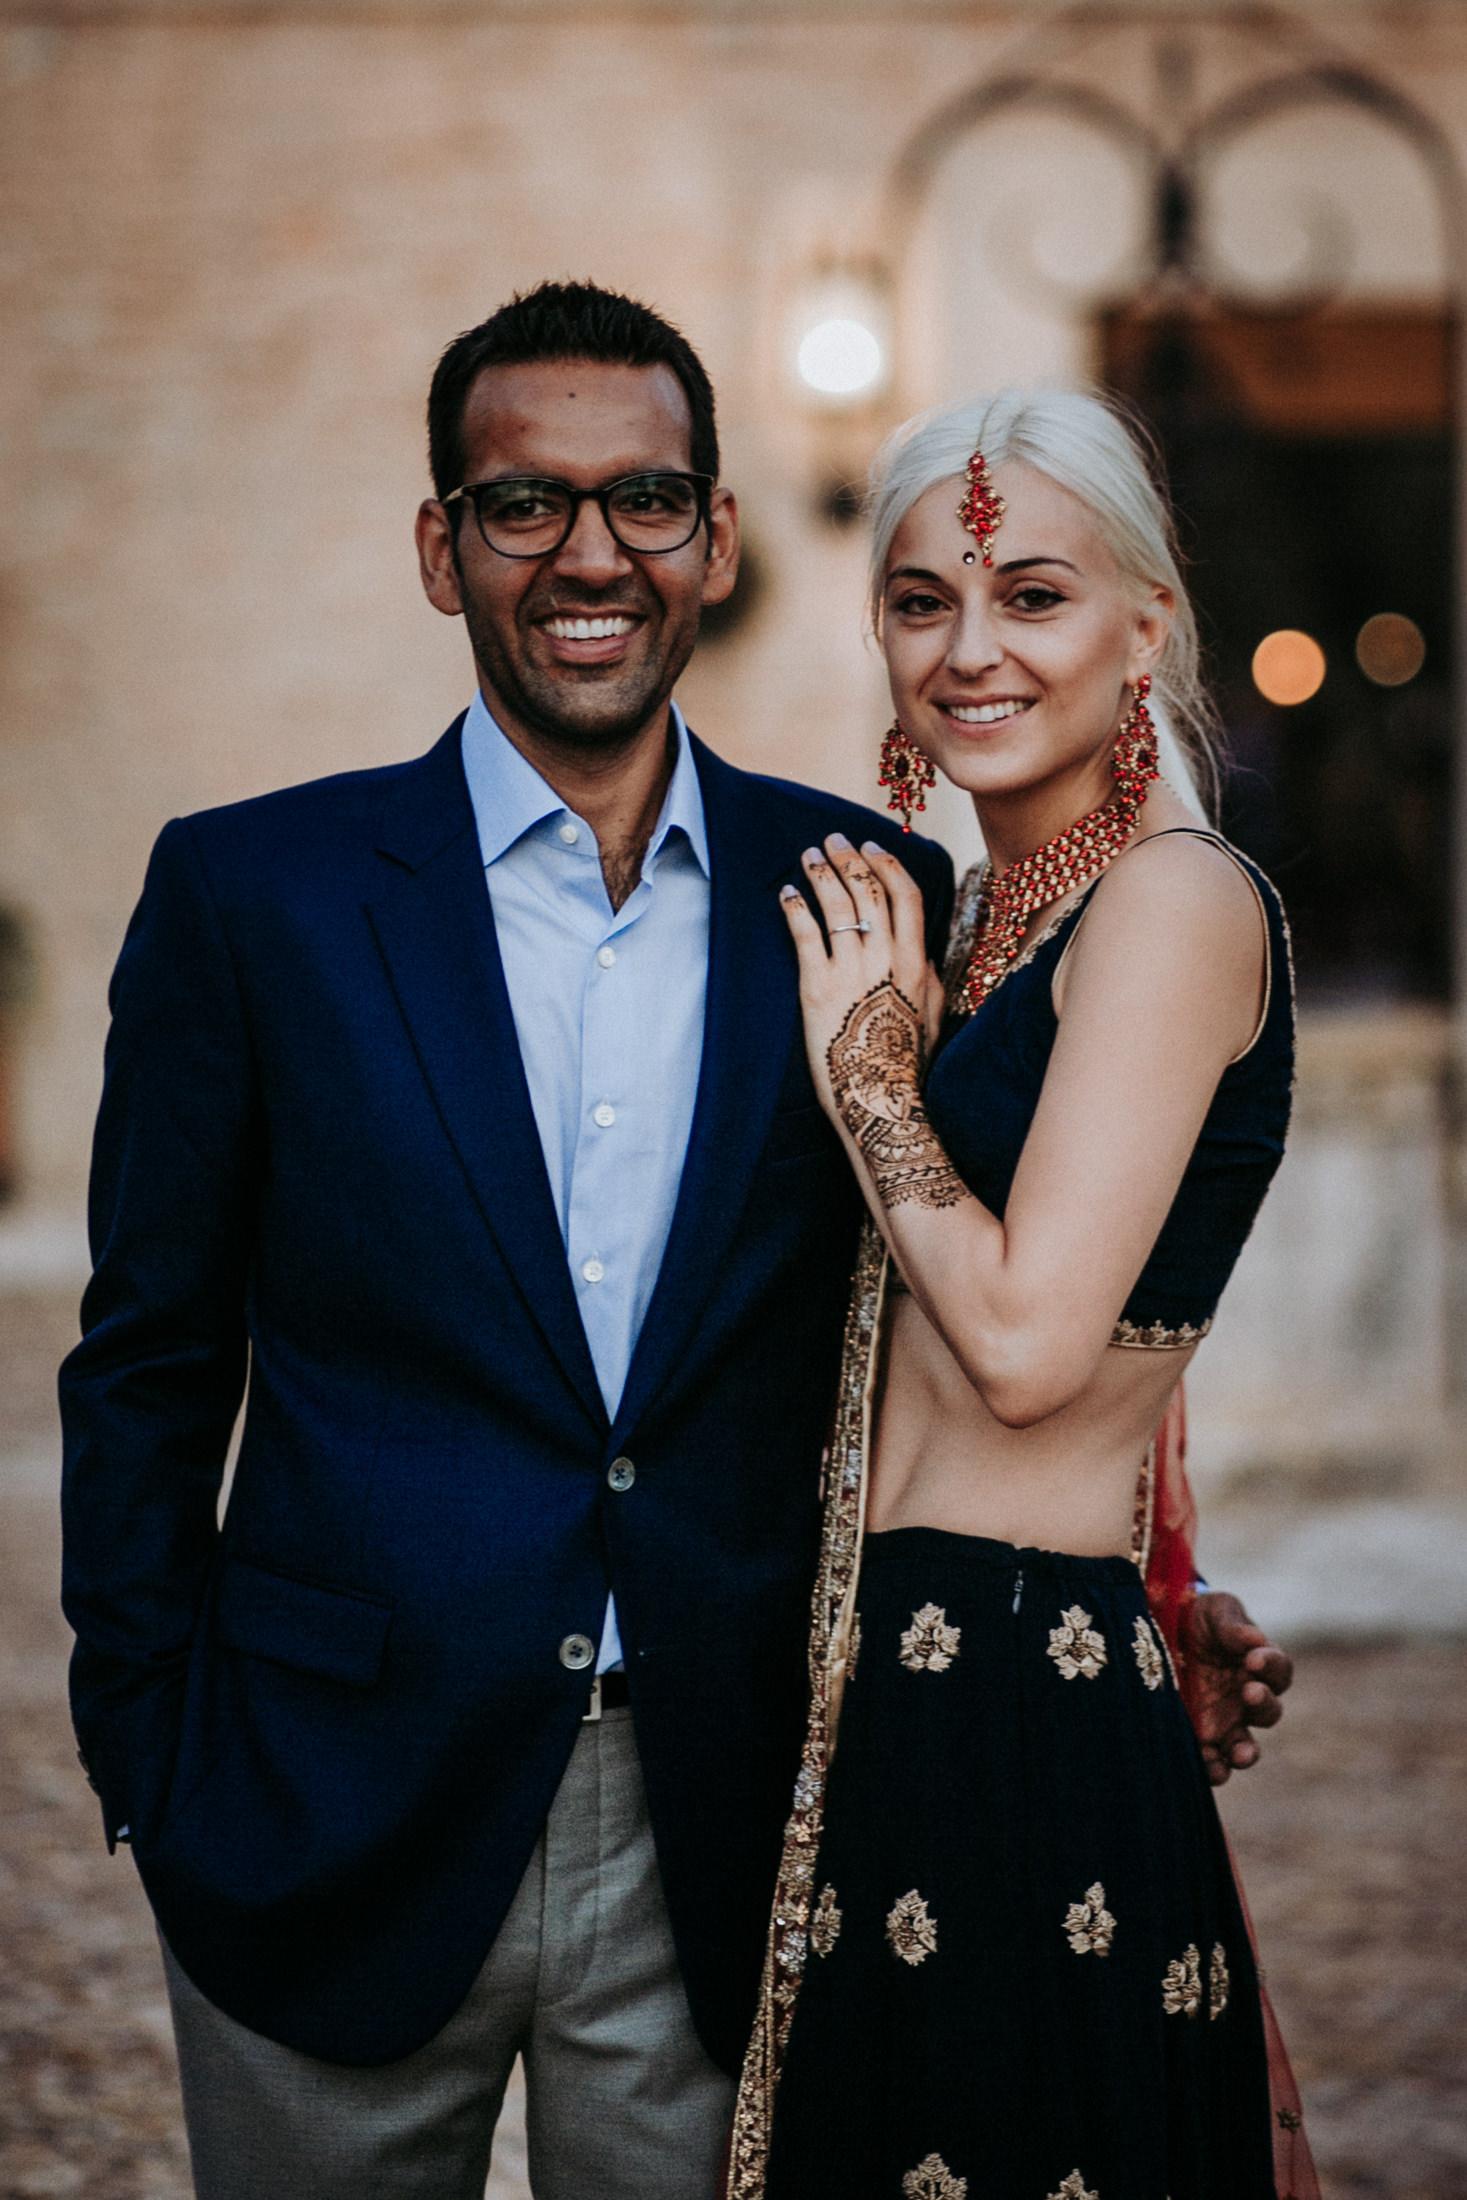 Wedding_Photographer_Mallorca_Daniela-Marquardt_Photography_New_York_Iceland_Tuscany_Santorini_Portugal_Austria_Bavaria_Elopement_Hochzeitsfotograf_AntjeRajat1_50